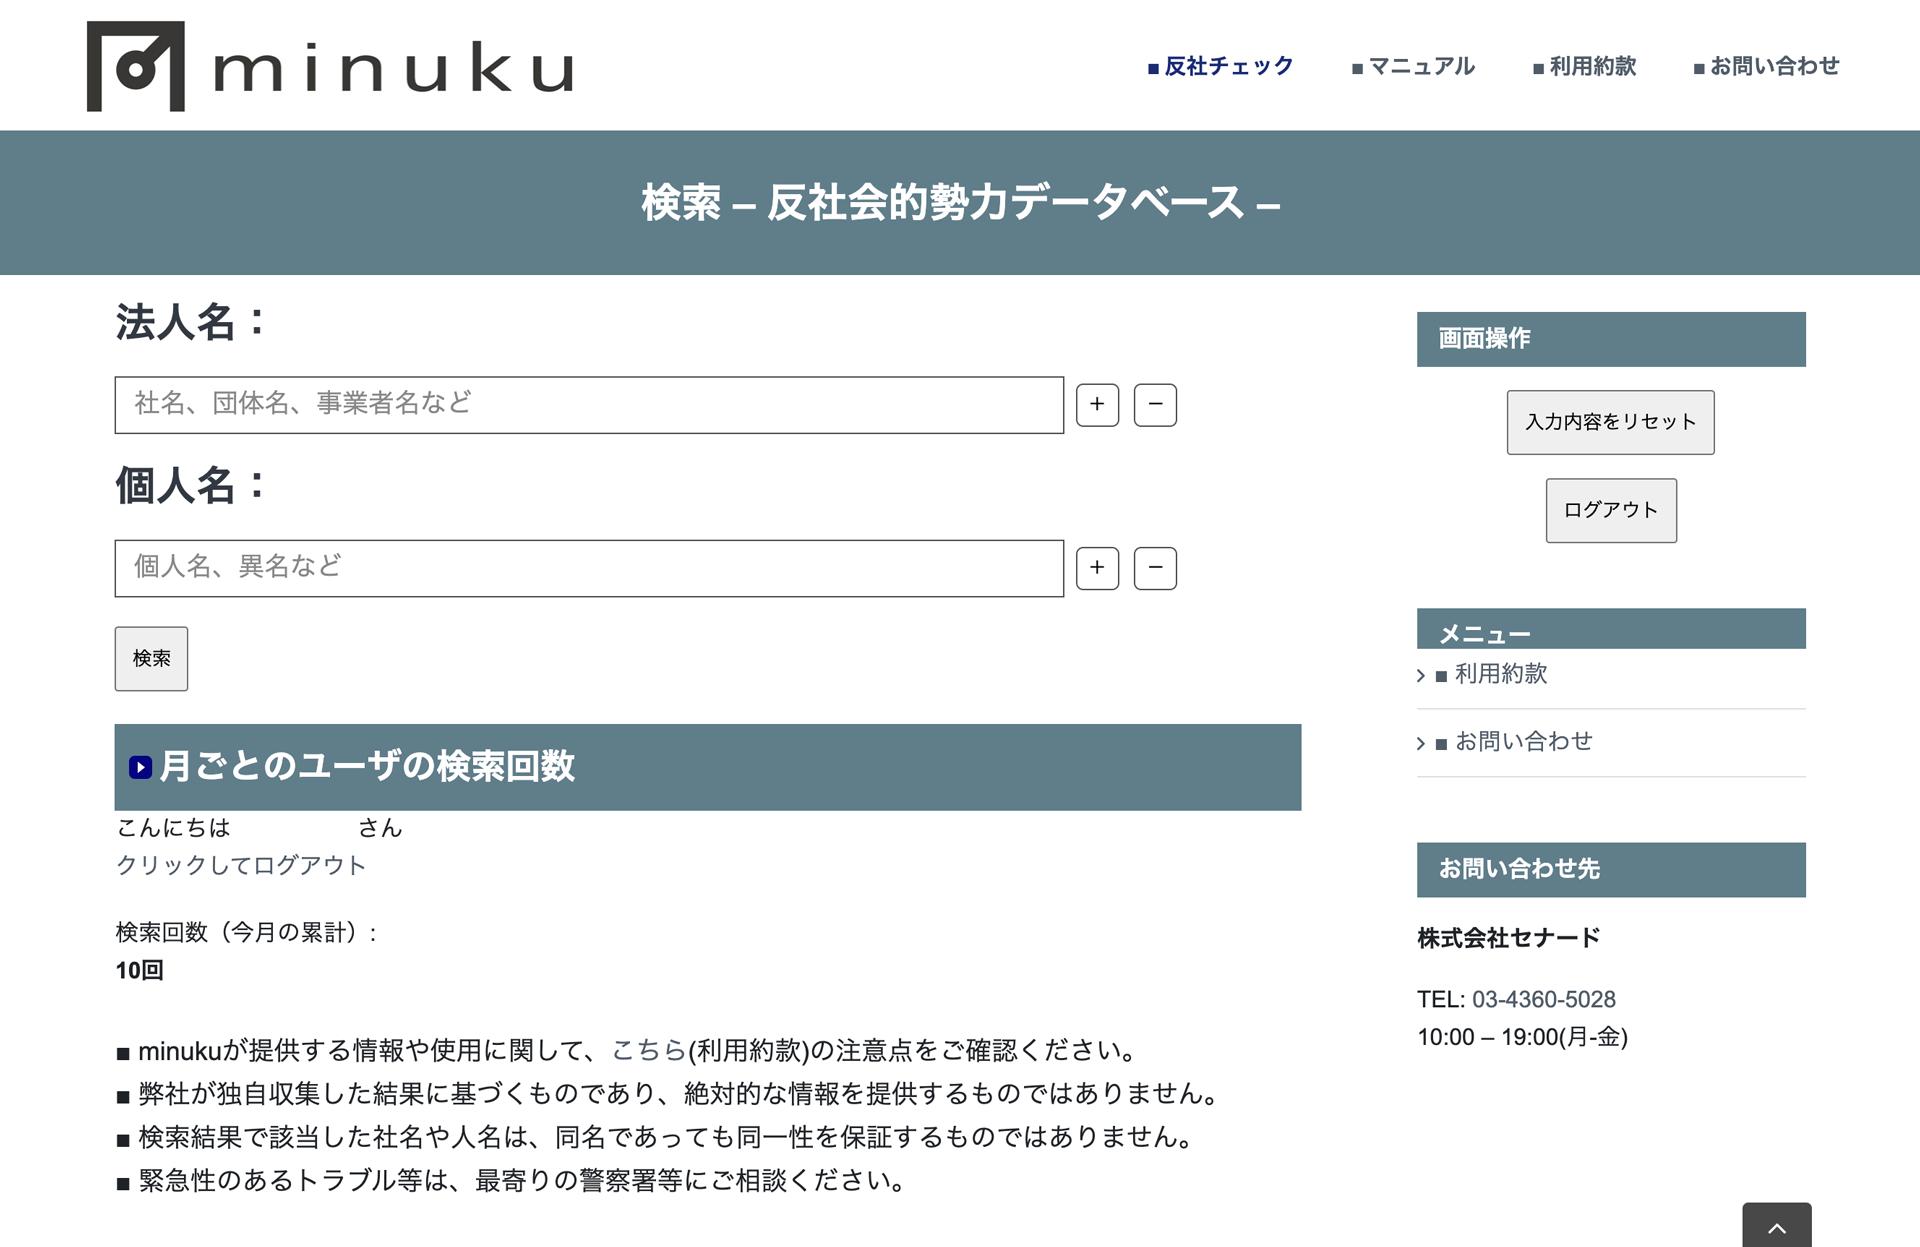 minuku 反社チェック画面